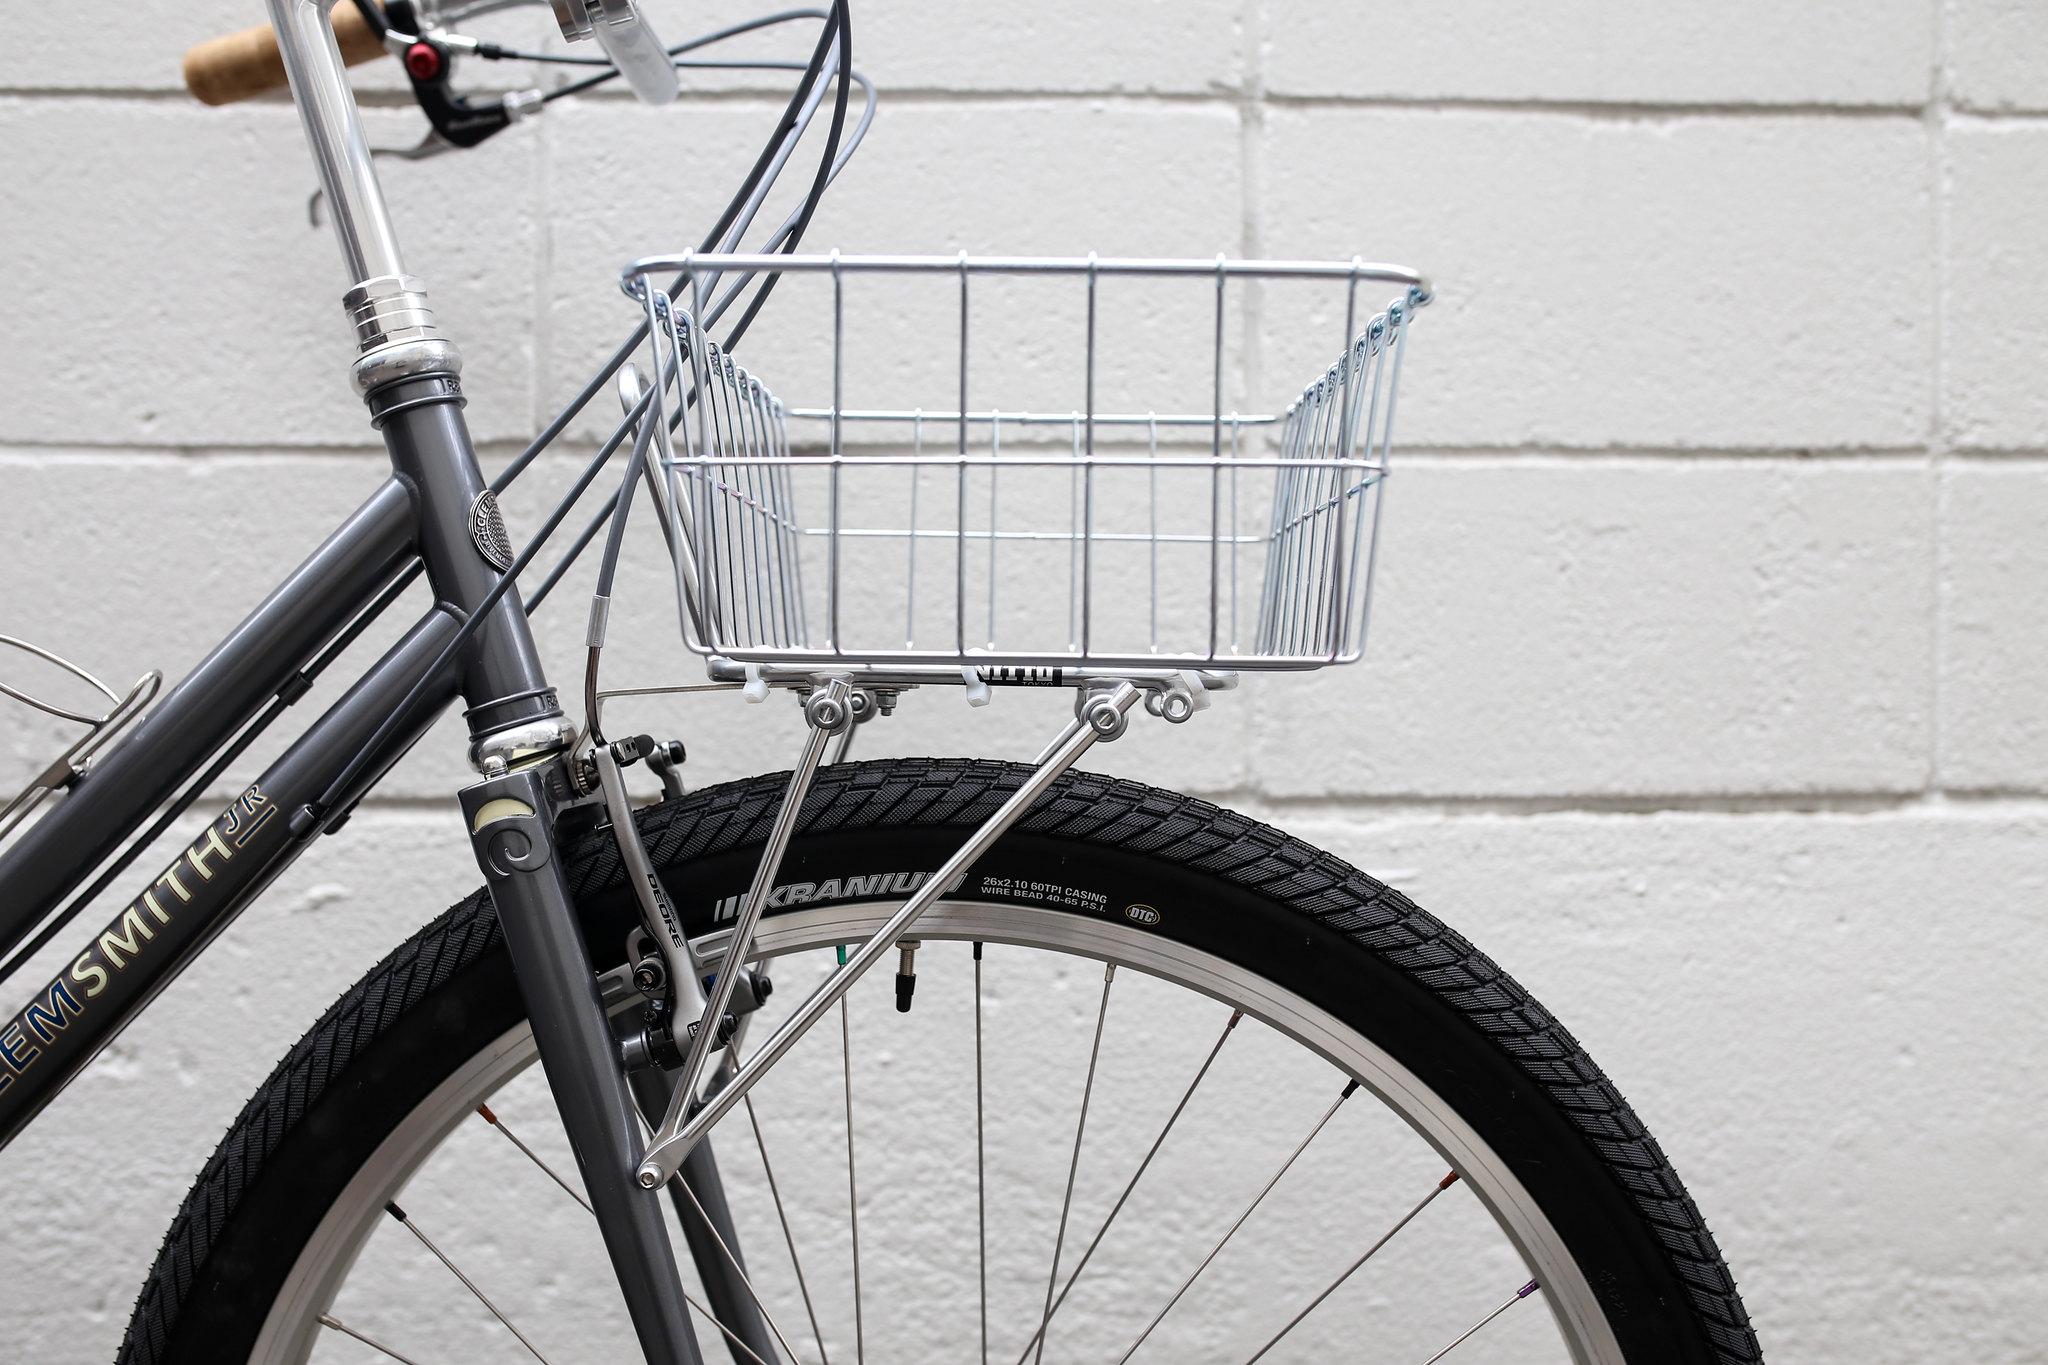 *RIVENDELL* clem smith jr. complete bike